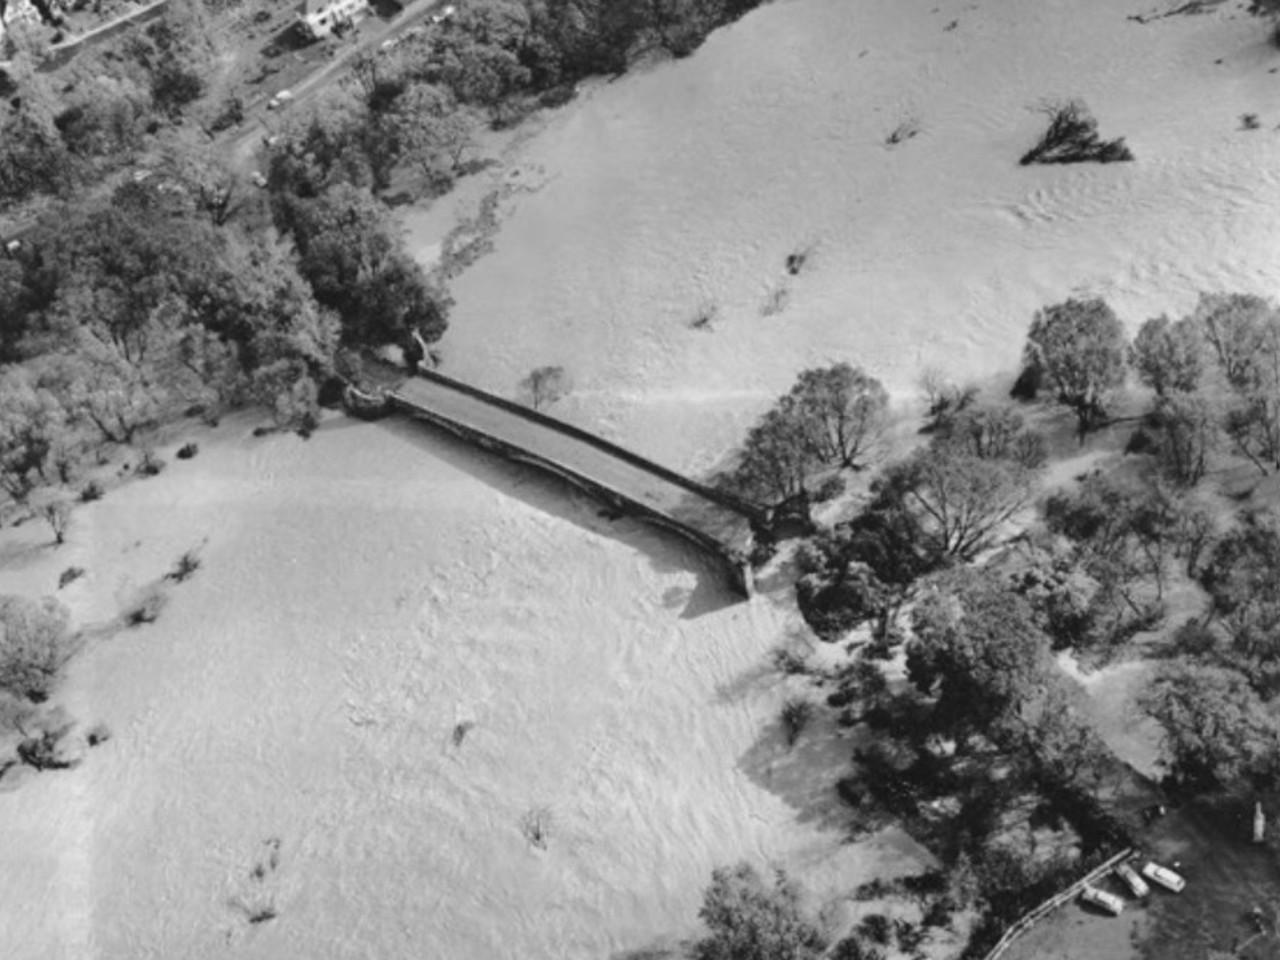 The devastating Hurricane Hazel ravaged Haiti, North Carolina, and the GTA